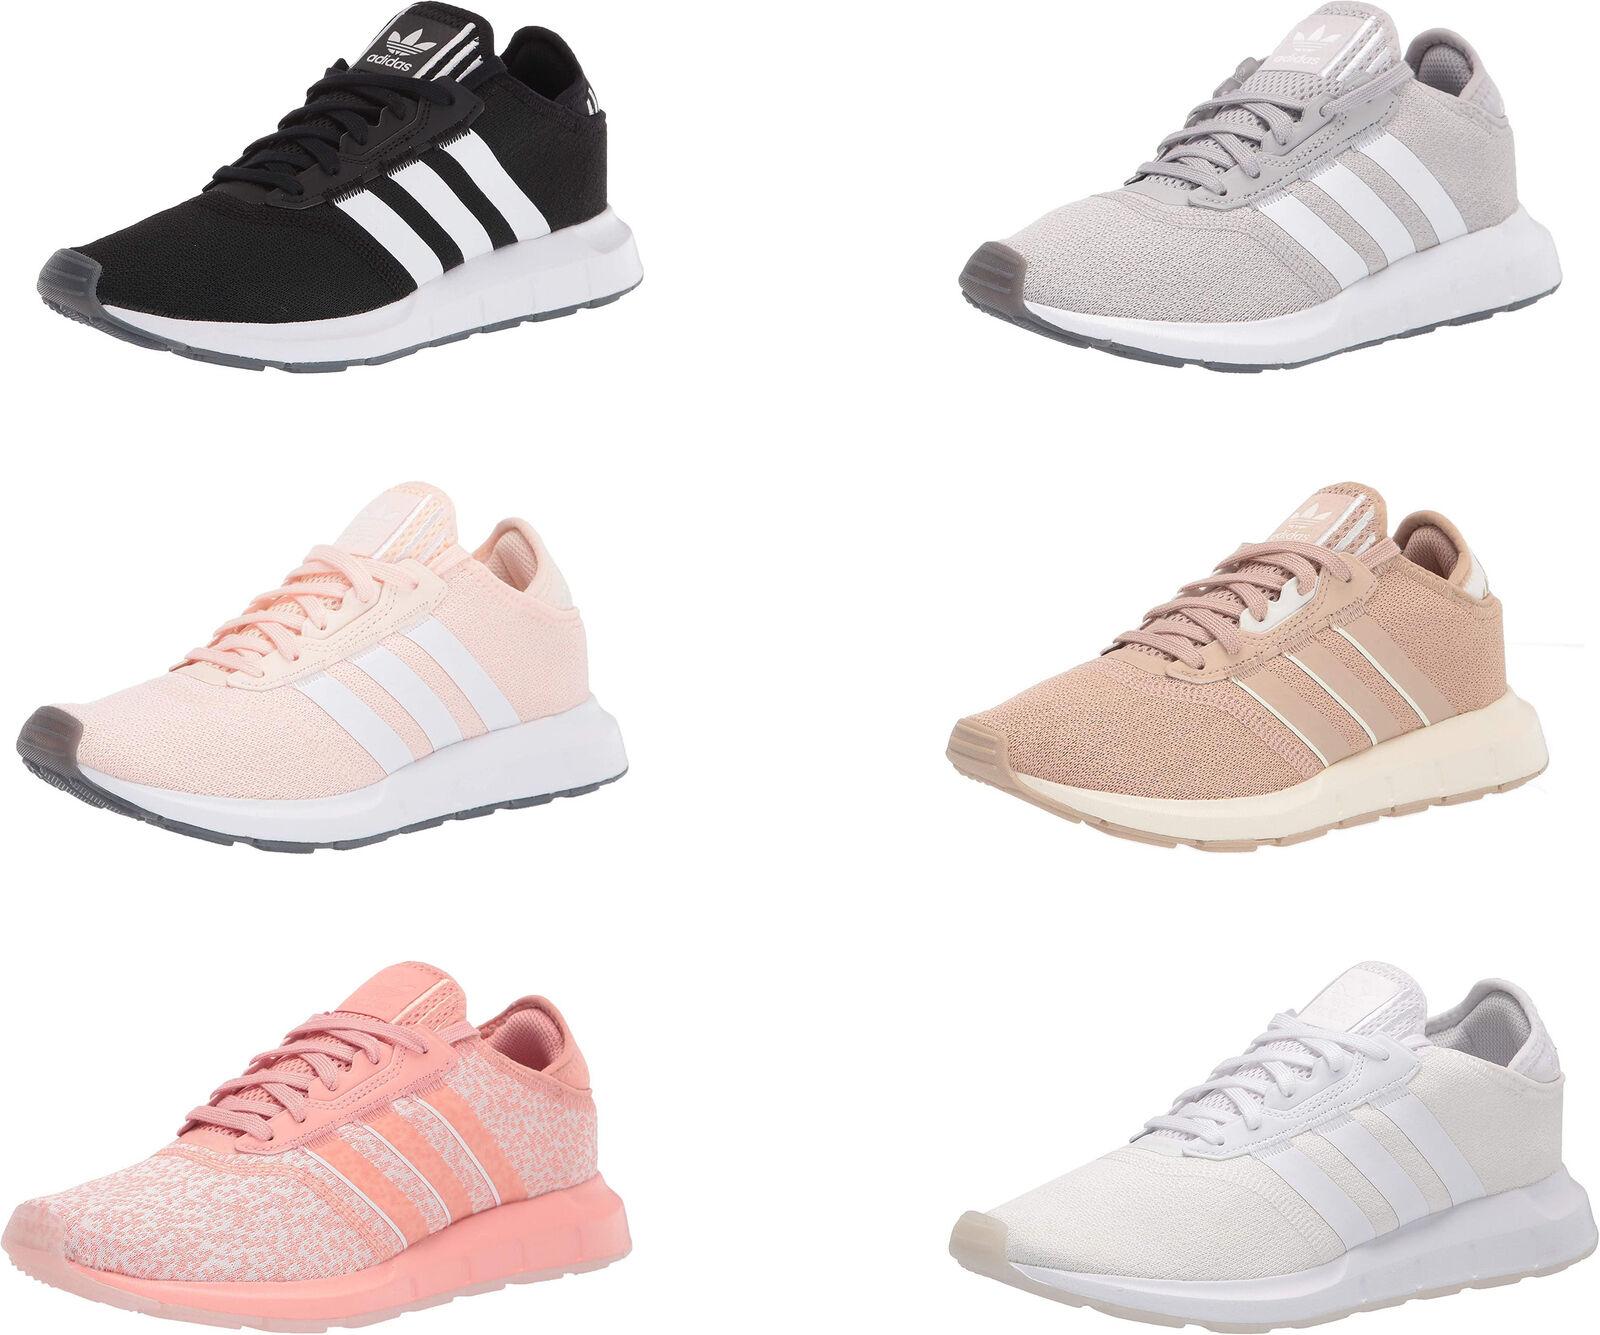 adidas Originals Women's Swift Run X Shoes | eBay